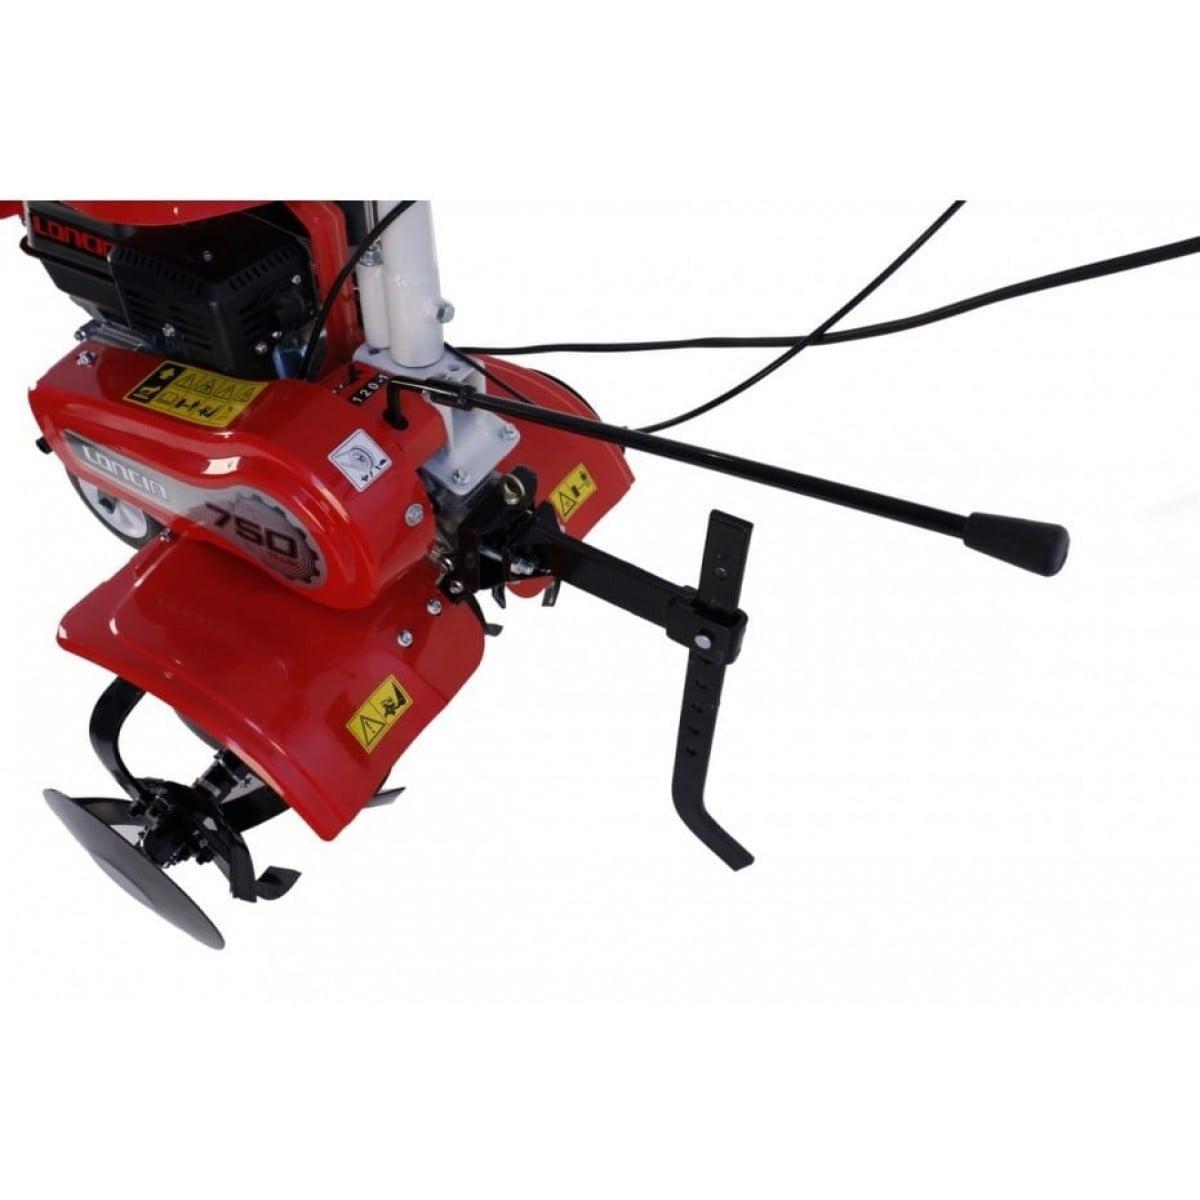 motocultor loncin lc750 7cp o mac.ro 13 2 13